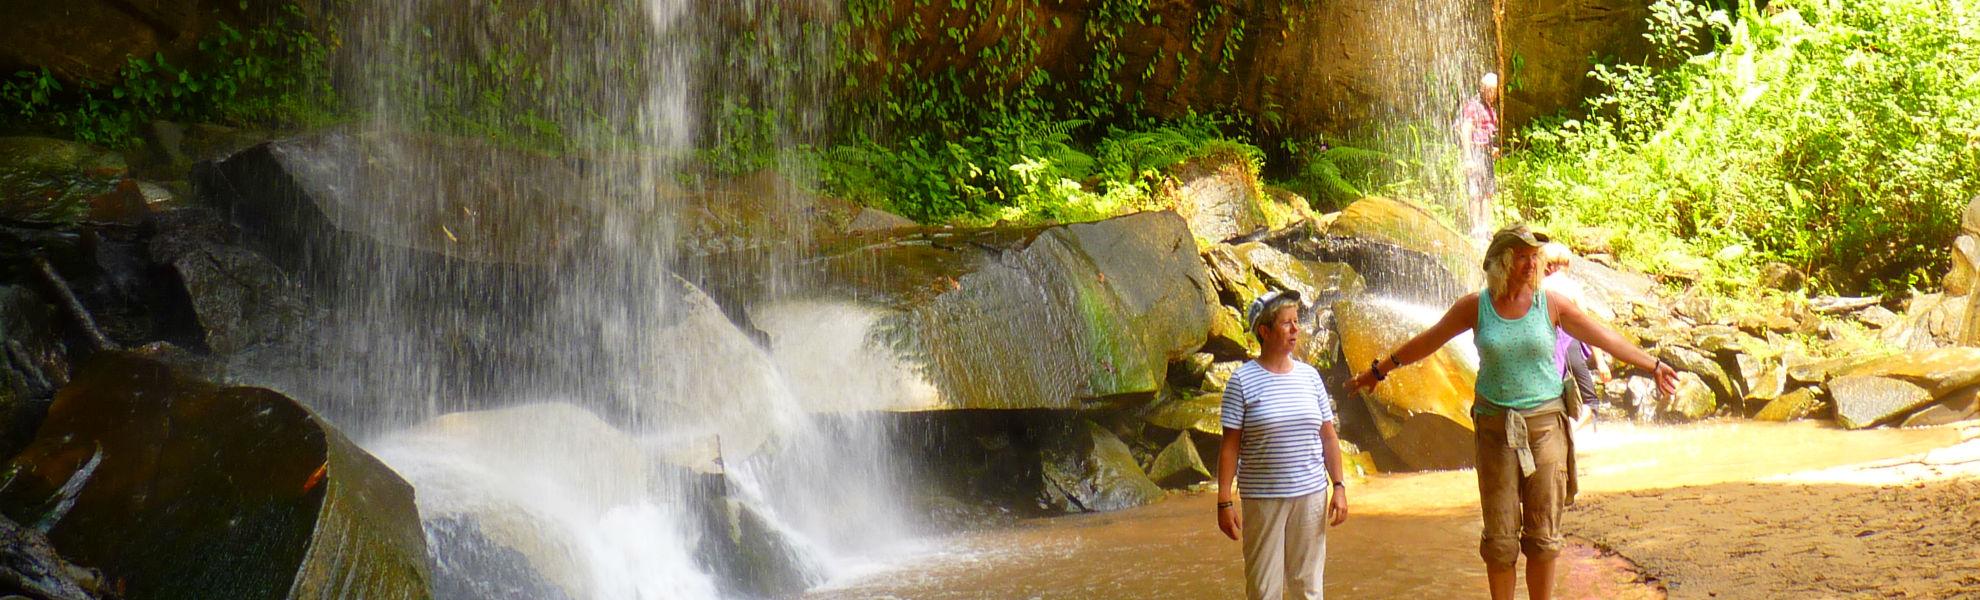 Sheldrick Falls in den Shimba Hills